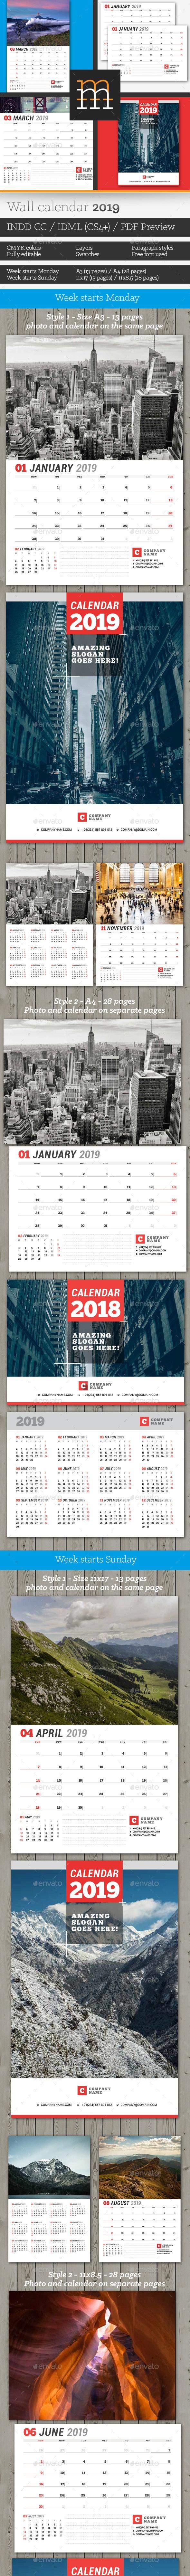 Wall Calendar 2019 - Calendars Stationery